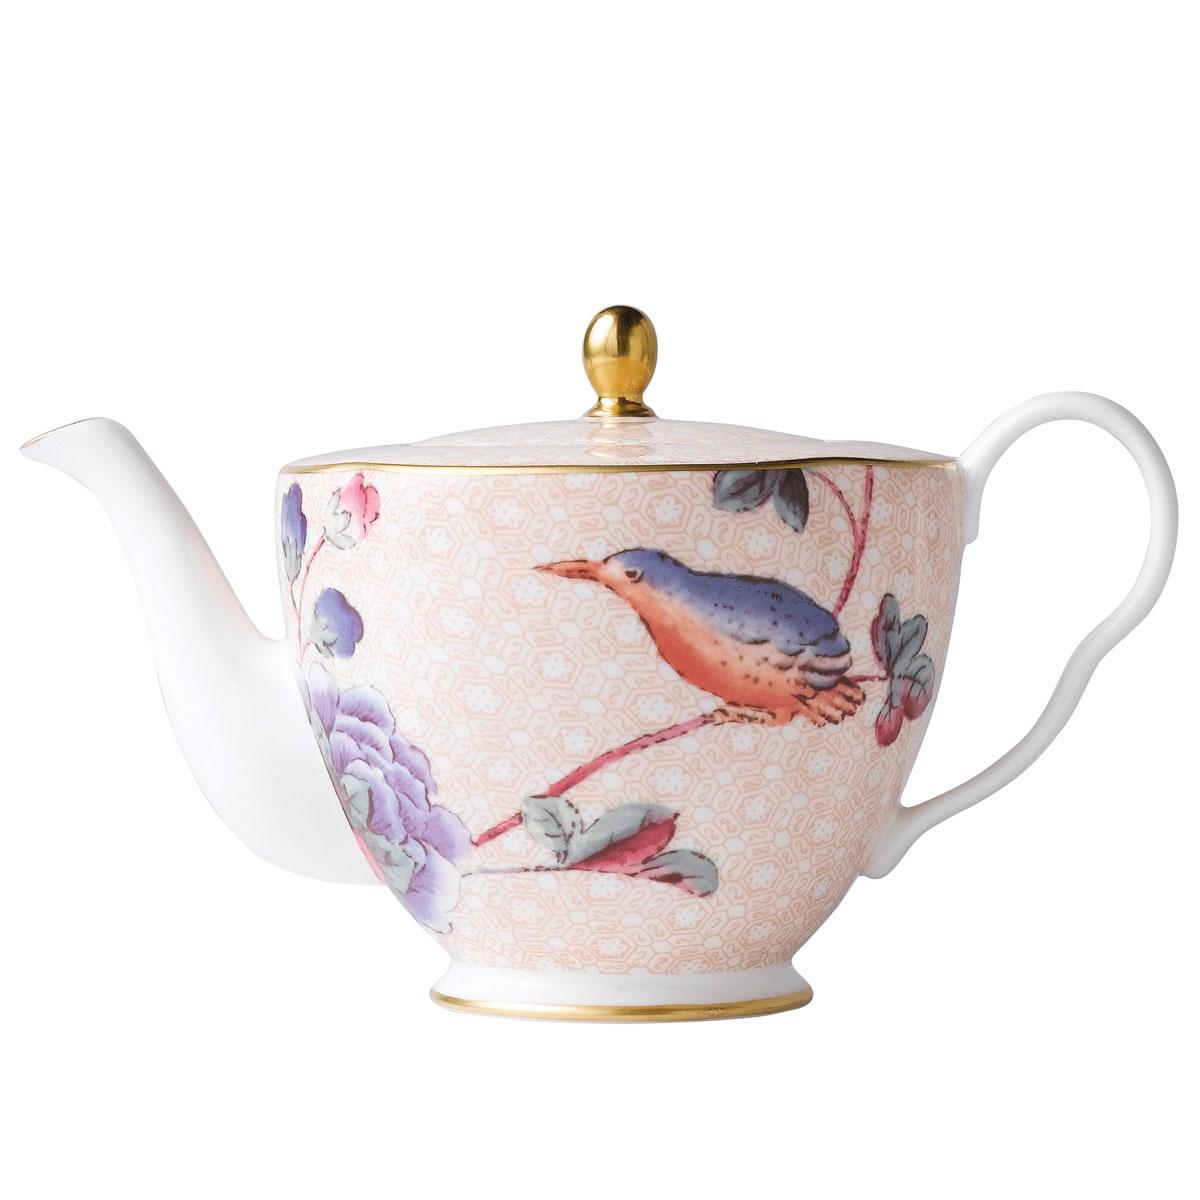 Wedgwood Cuckoo Teapot 12.5oz.